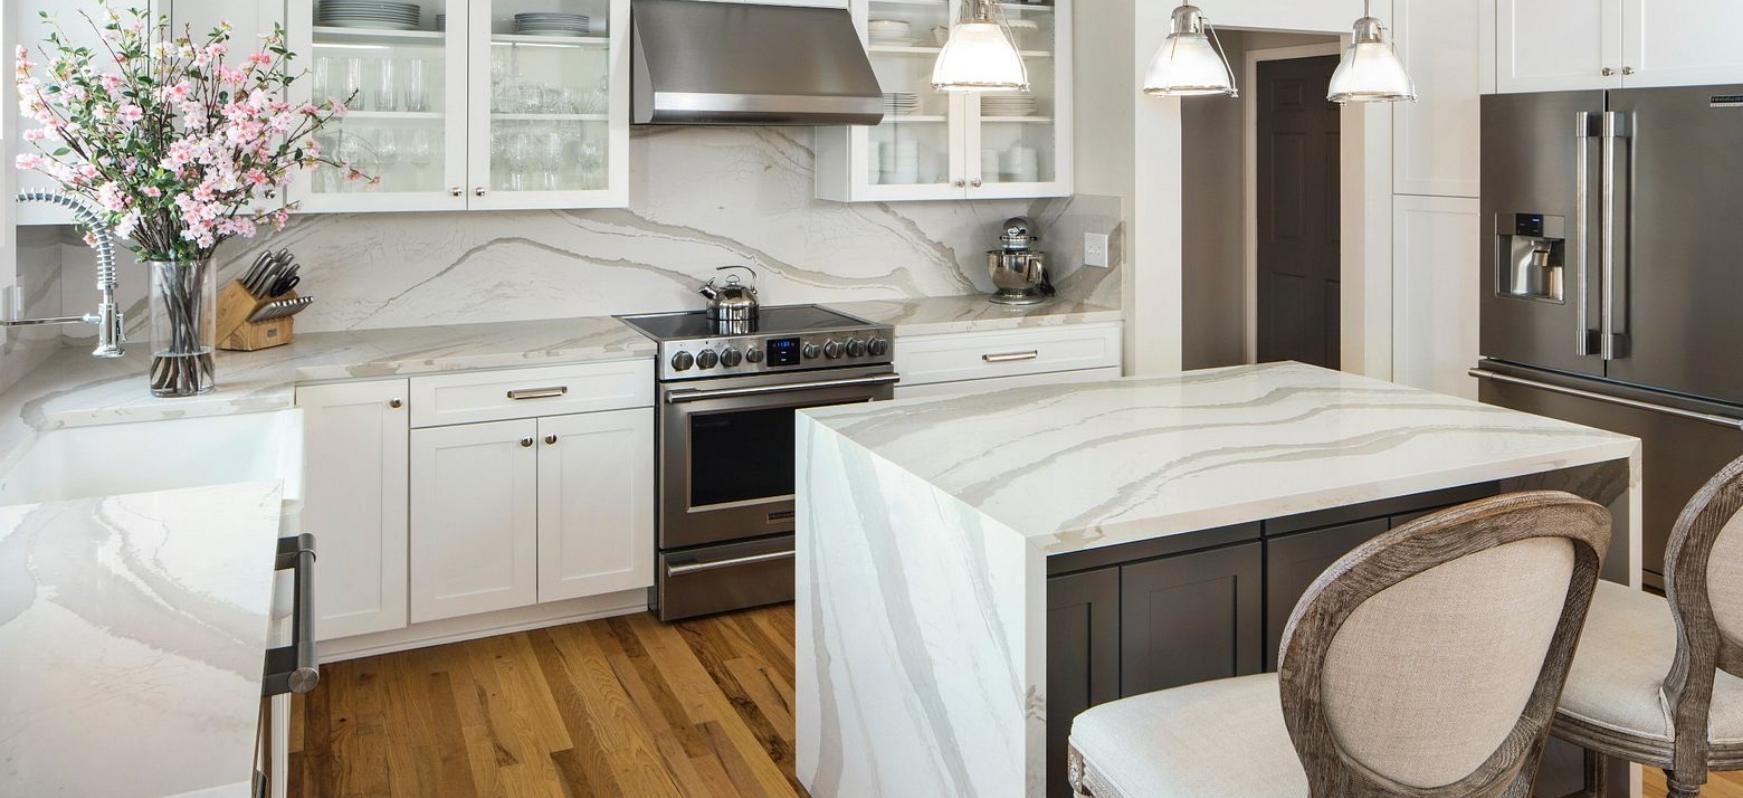 Cambria Quartz Brittanicca Warm Kitchen with Full Height Quartz Backsplash and a Waterfall Panel Island